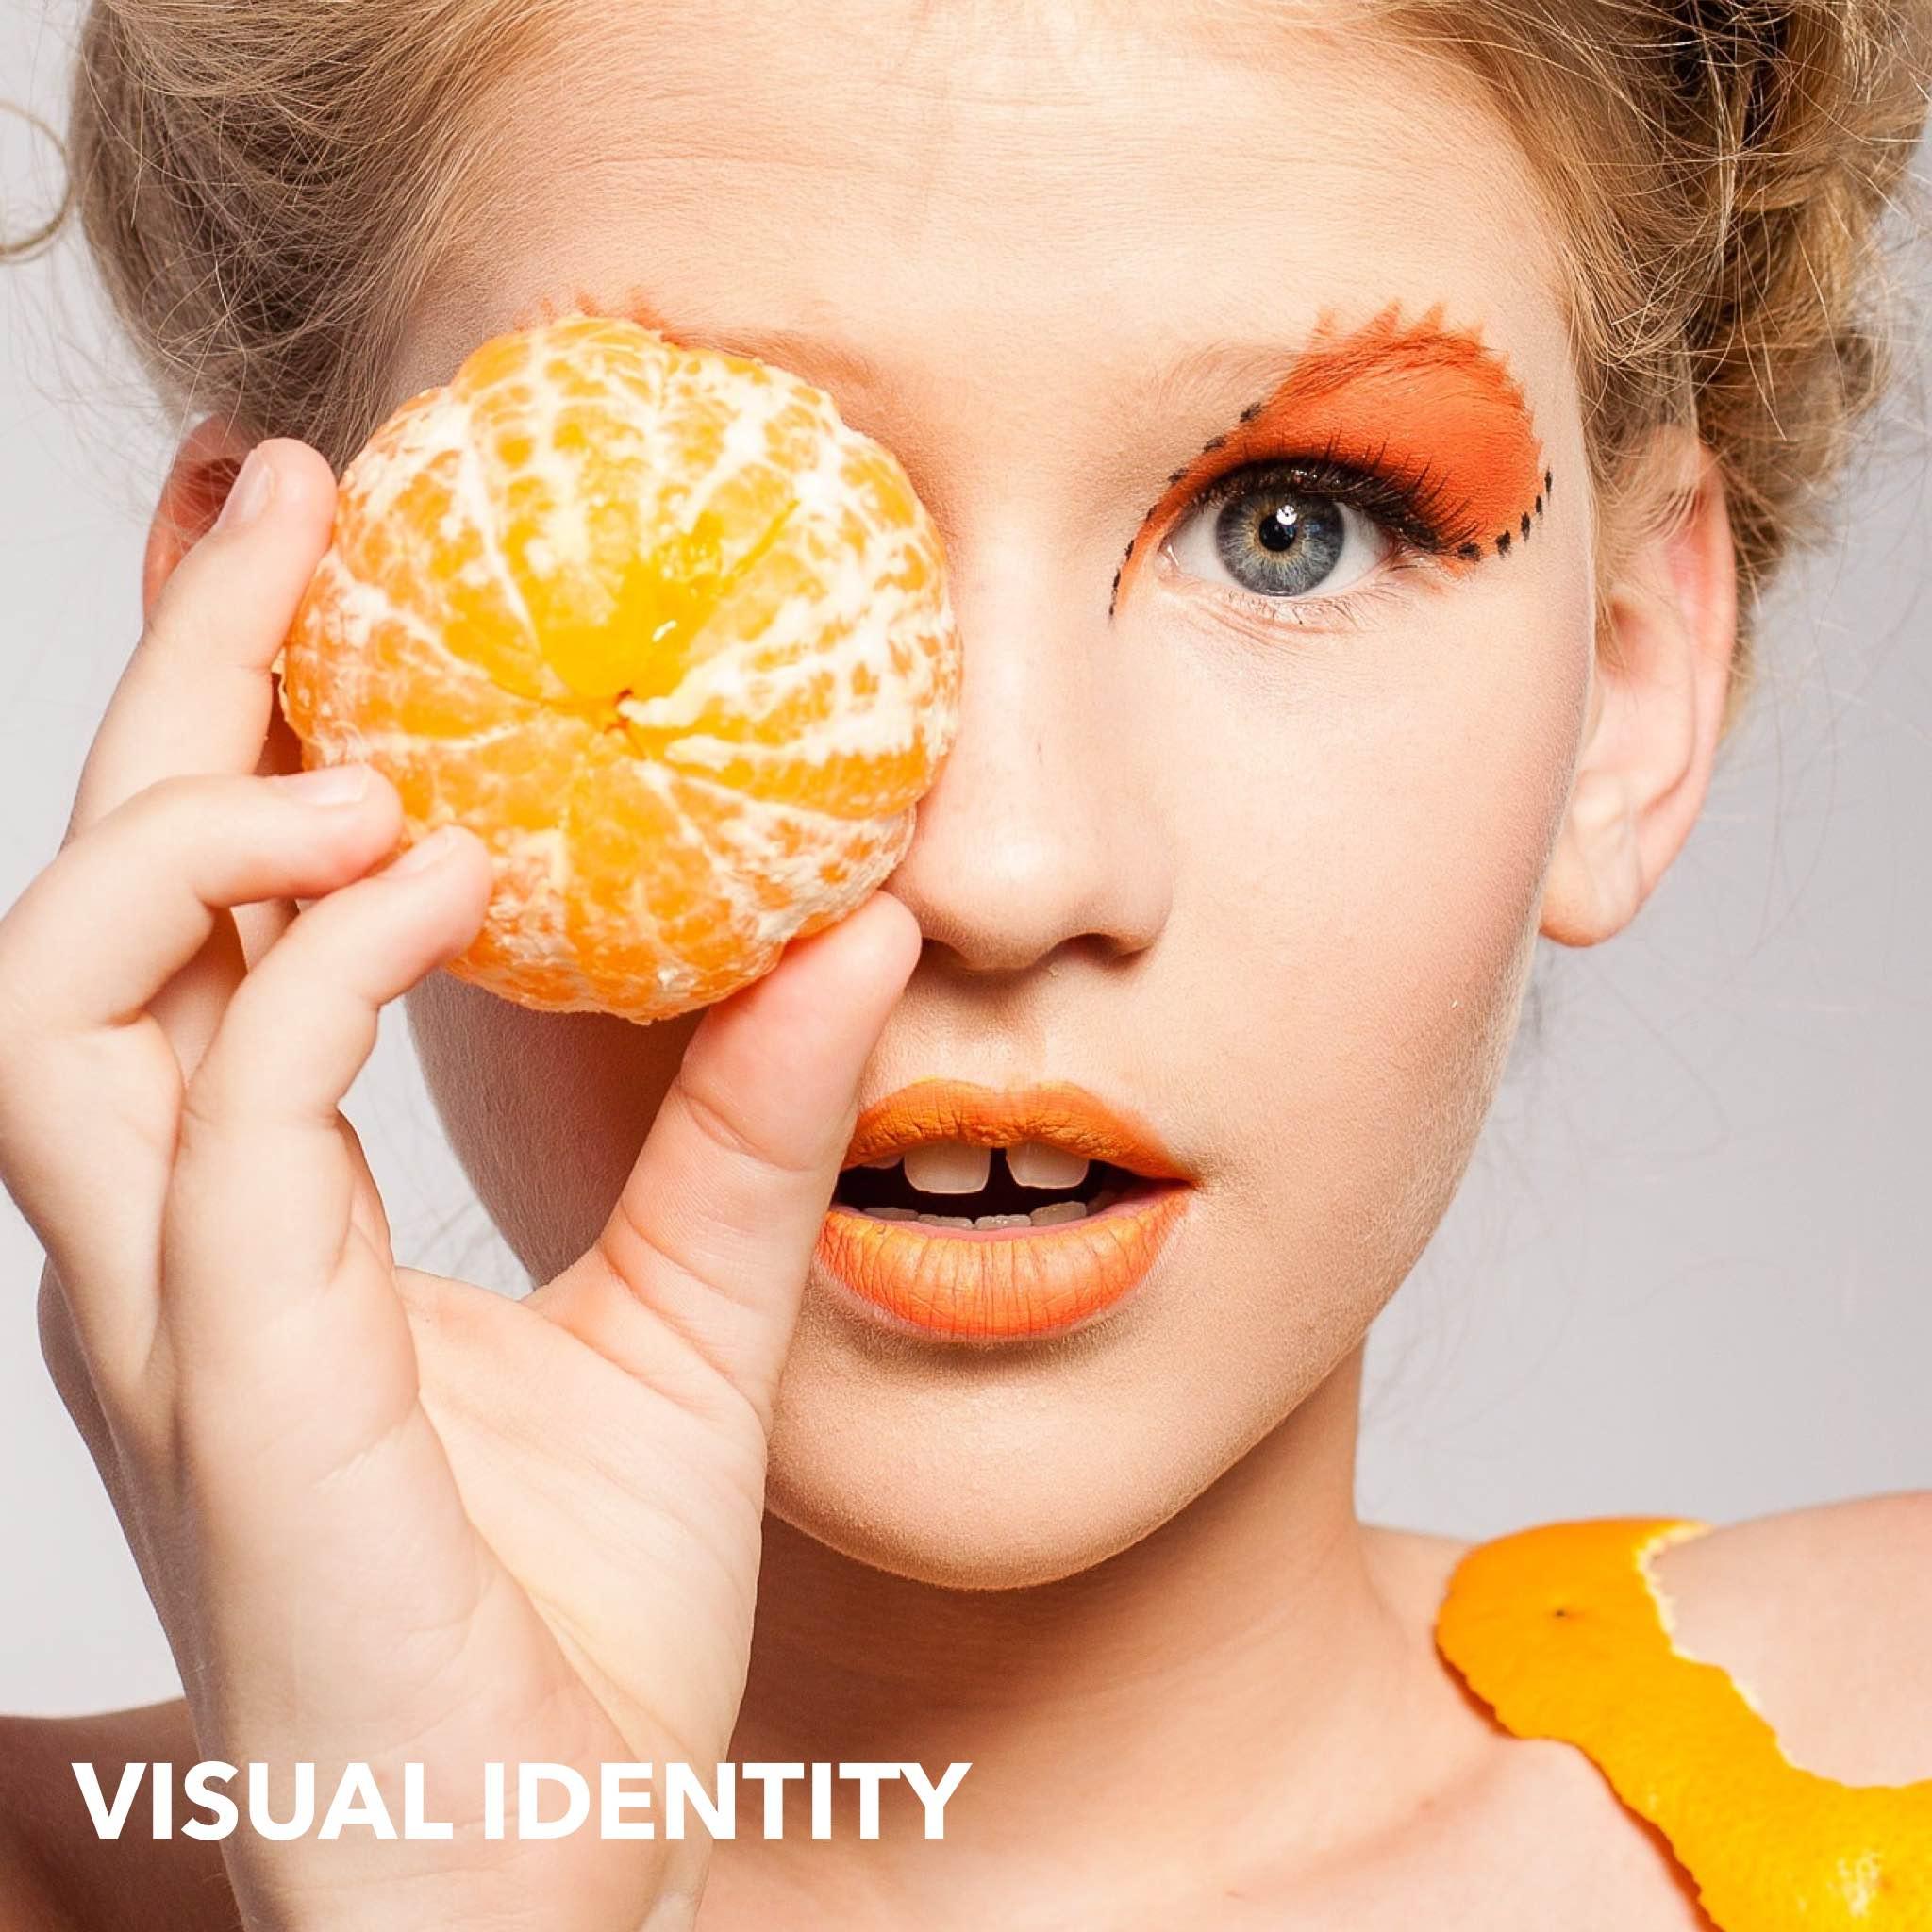 visual identity.jpg